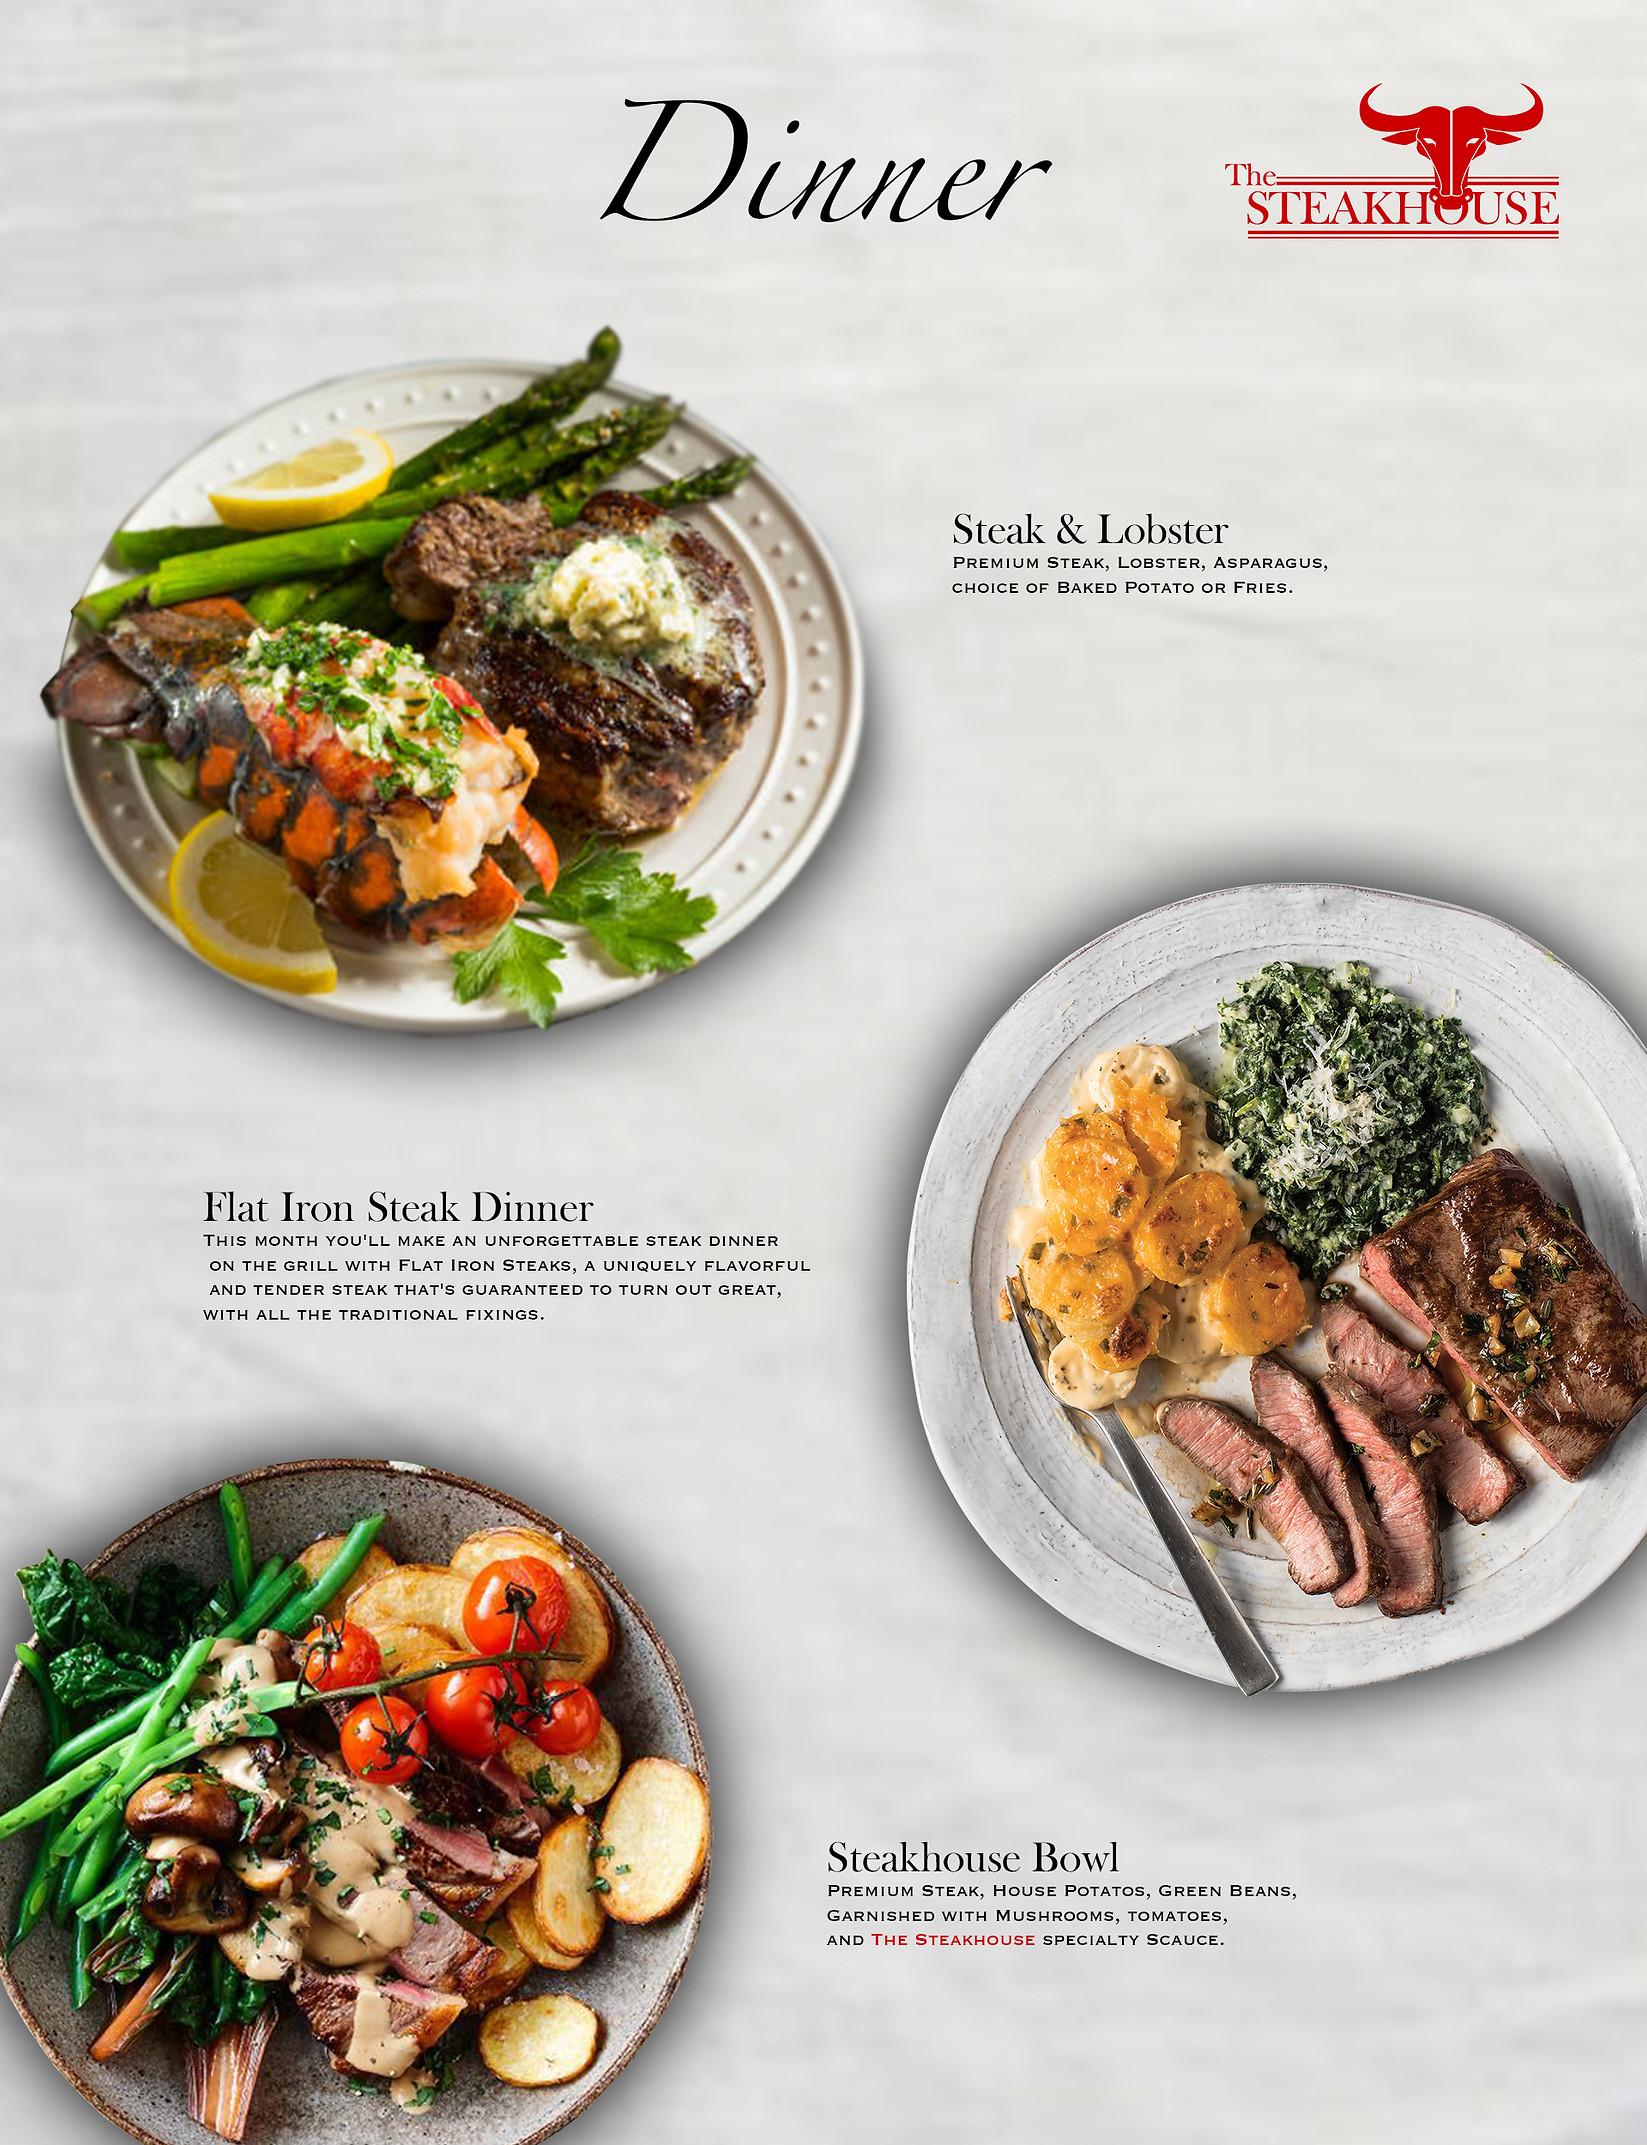 Dinner page.jpg